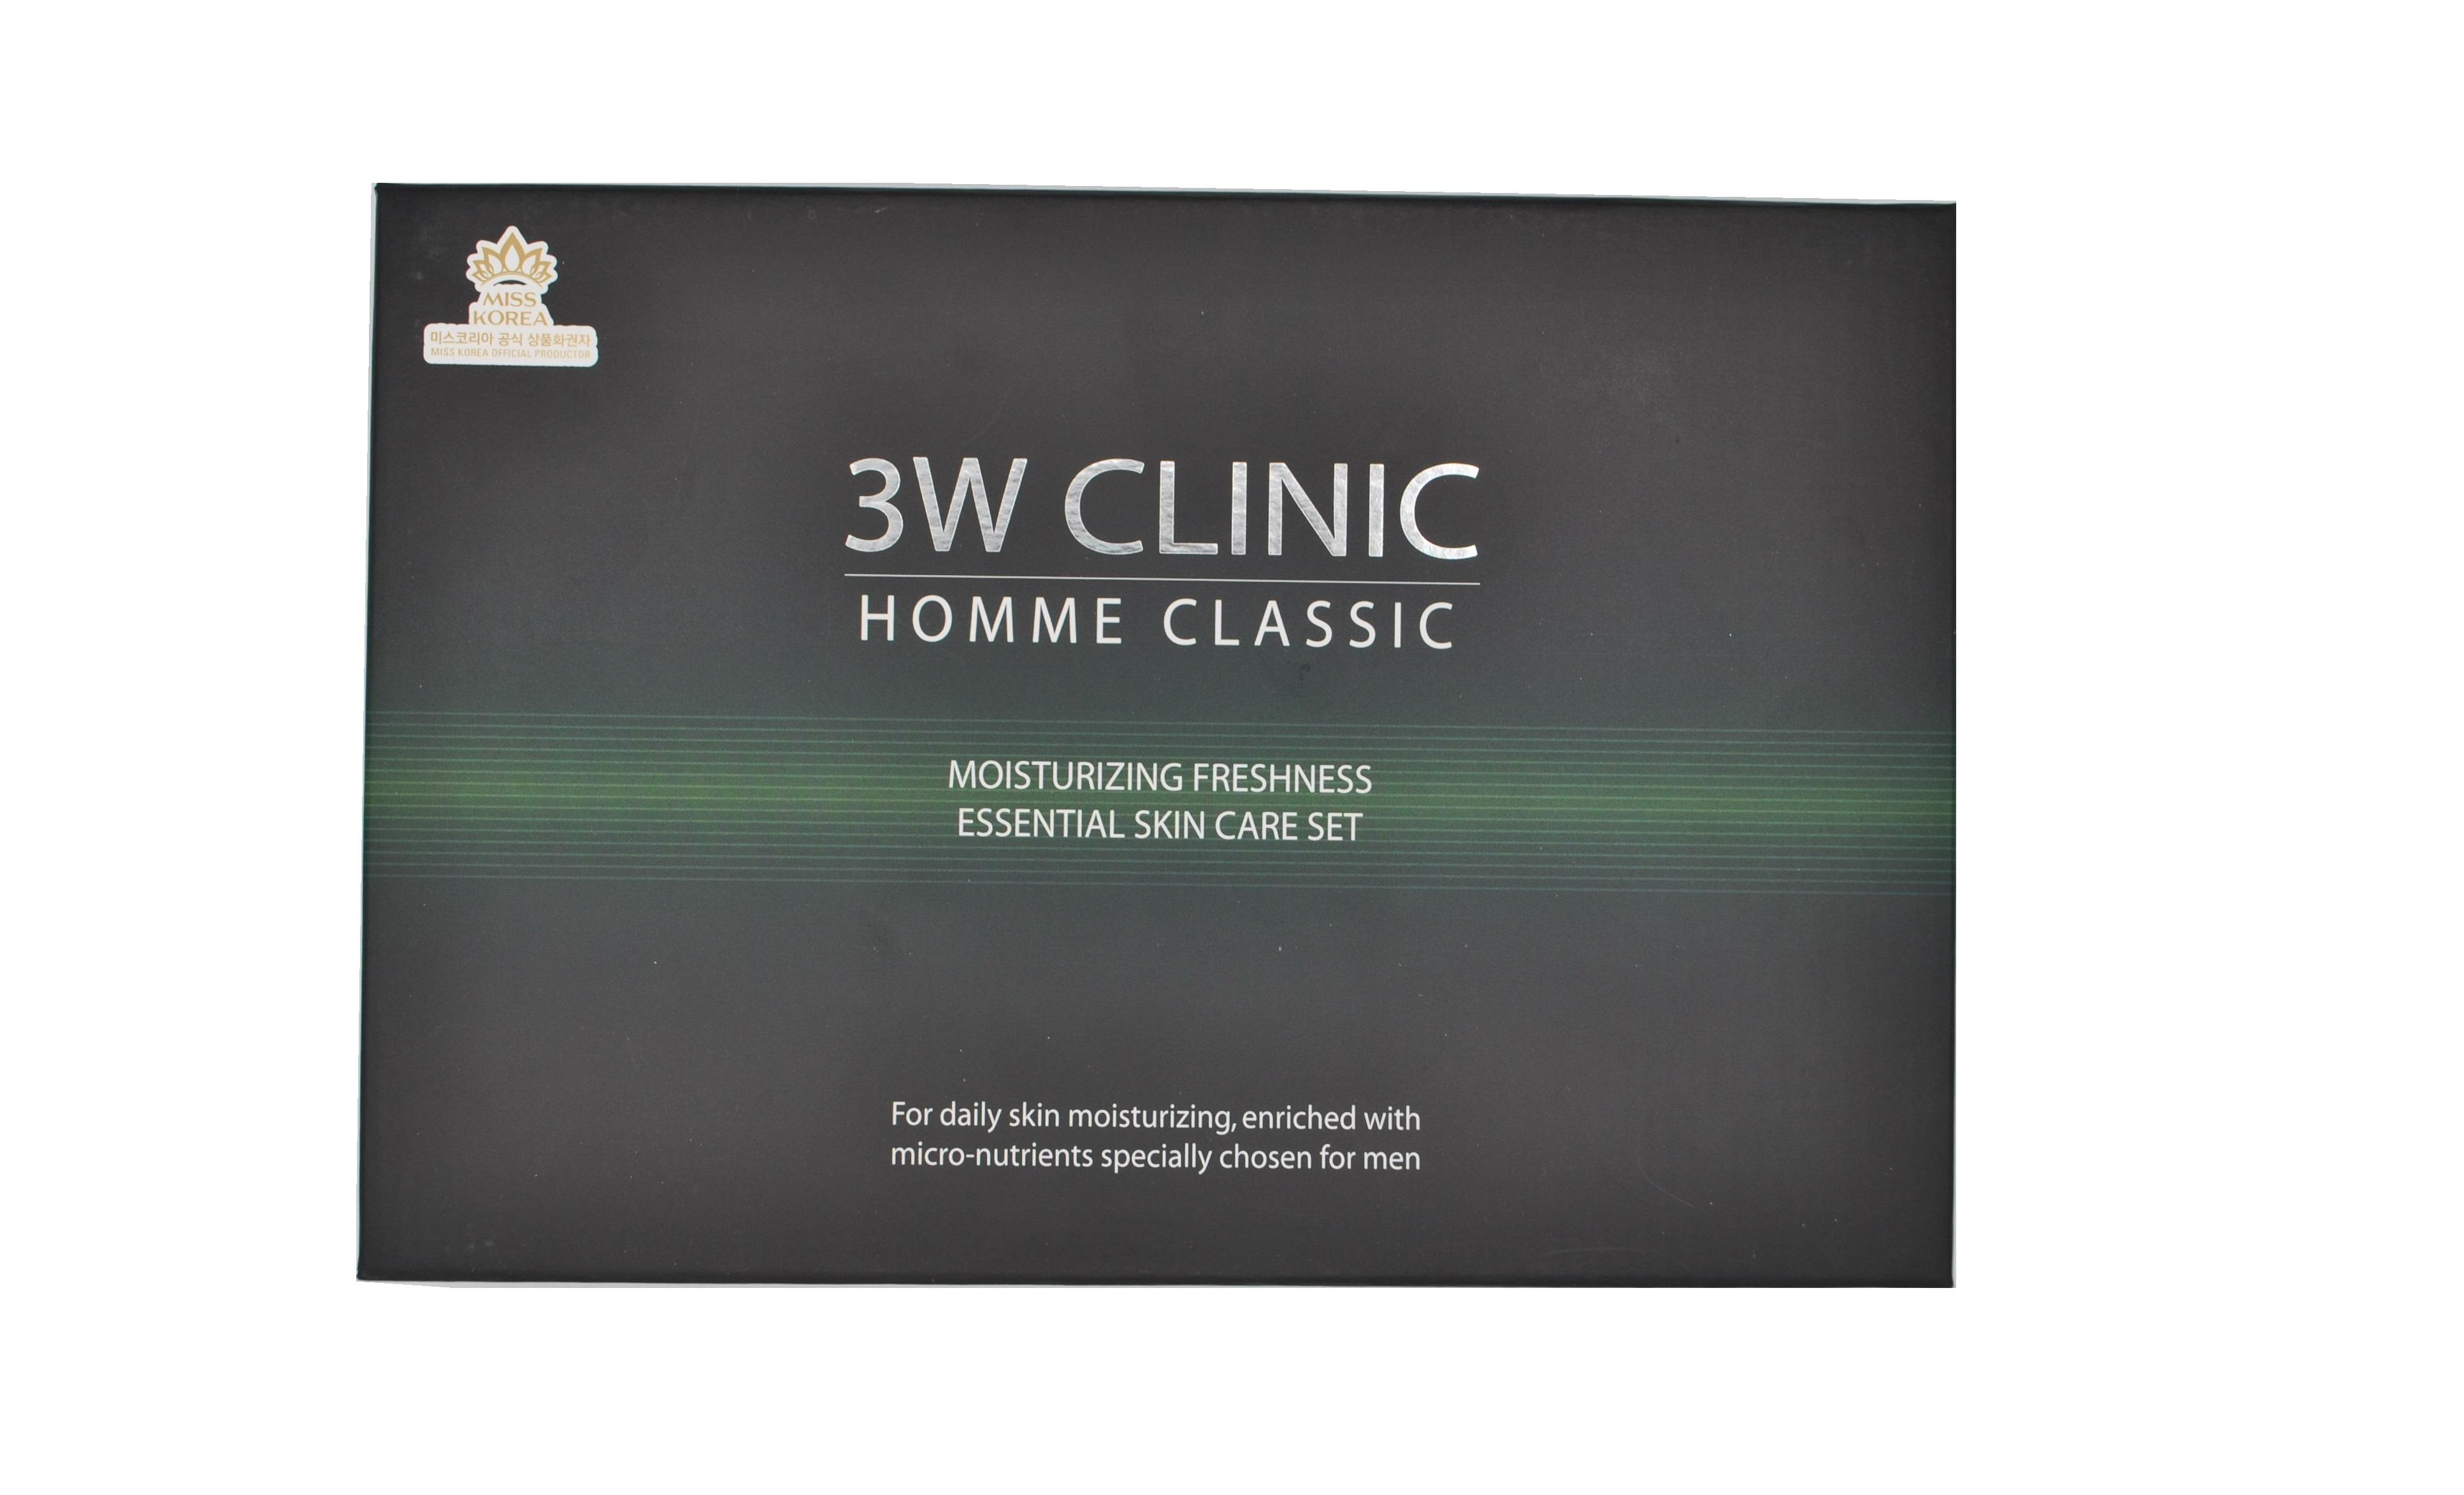 3W CLINIC Набор мужской (эссенция 150 мл, эмульсия 150 мл, эссенция мини 30 мл, эмульсия мини 30 мл) CLASSIC MOISTURIZING